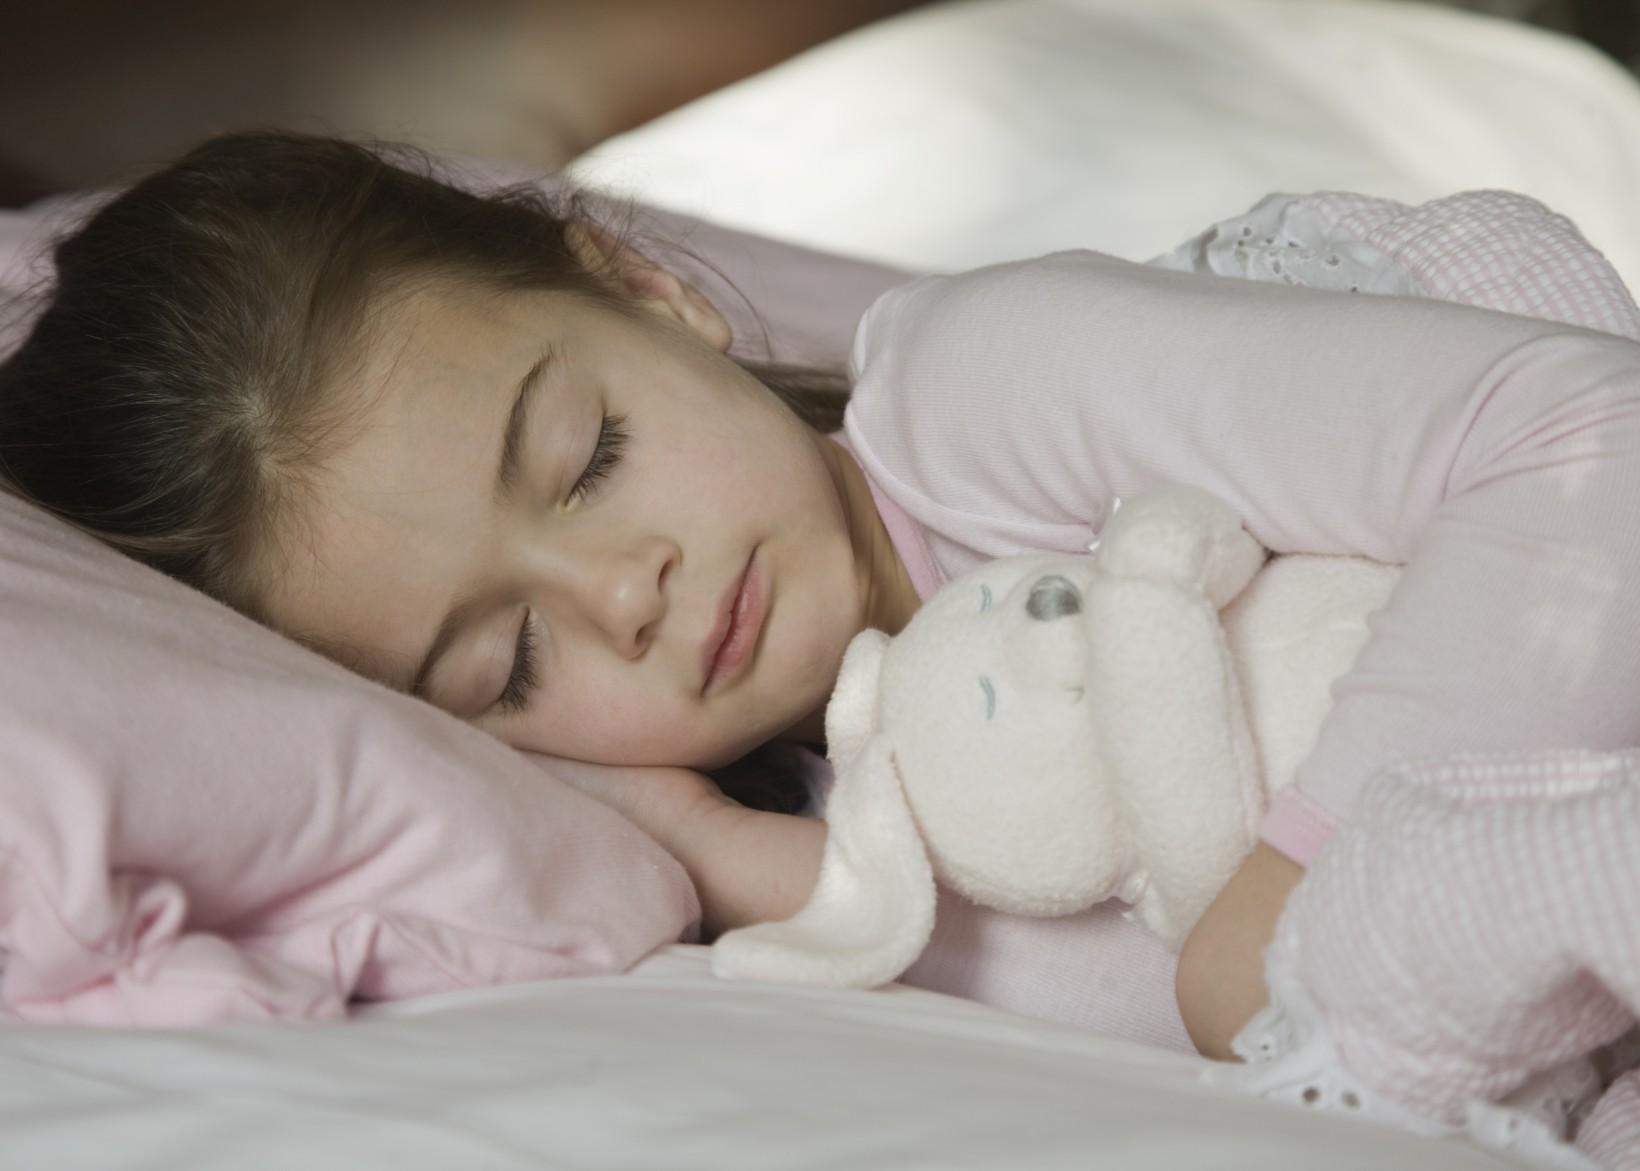 sleeping نصائح العودة الى المدرسة